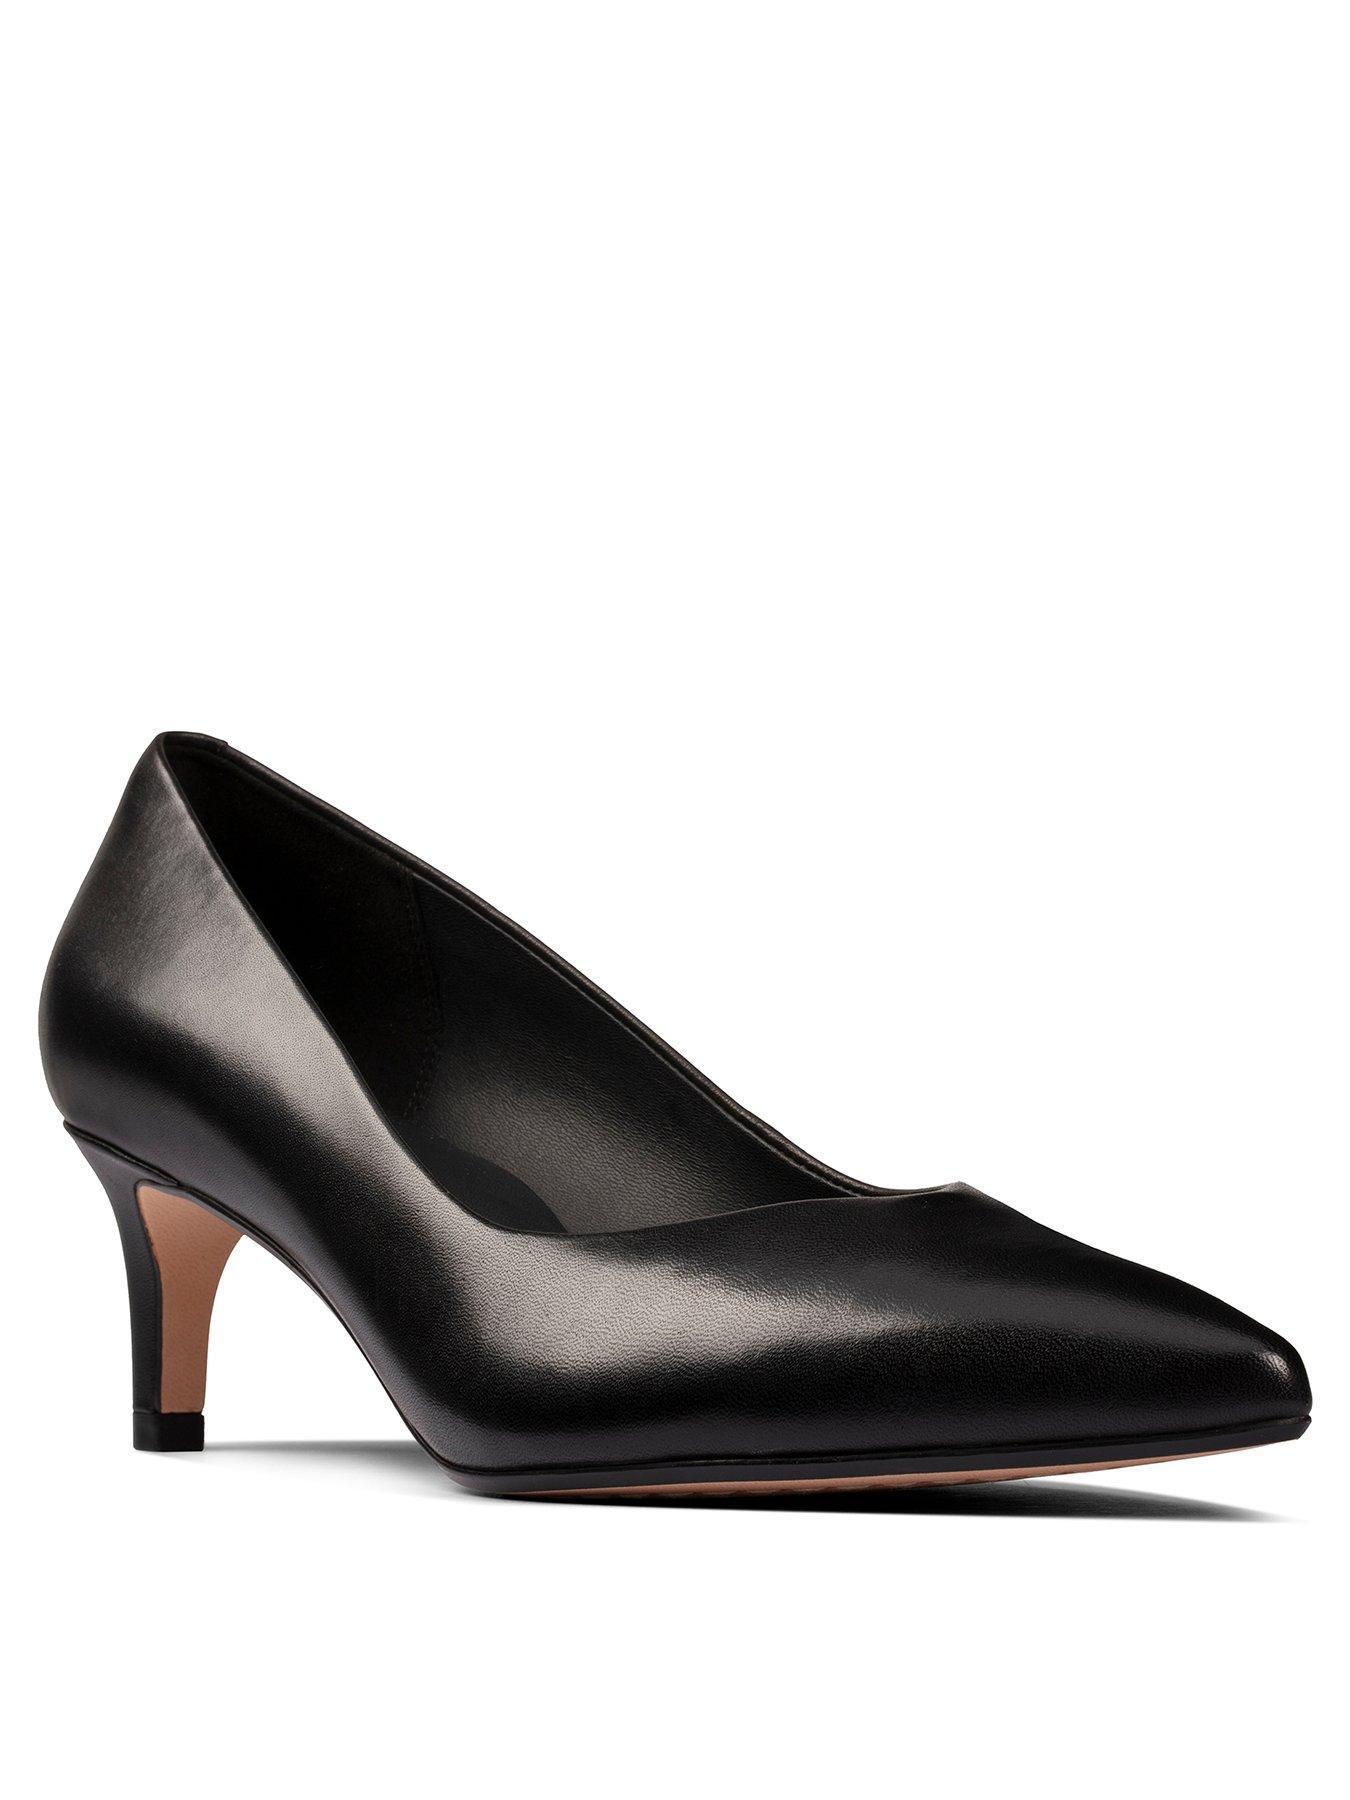 Formal | Clarks | Shoes \u0026 boots | Women